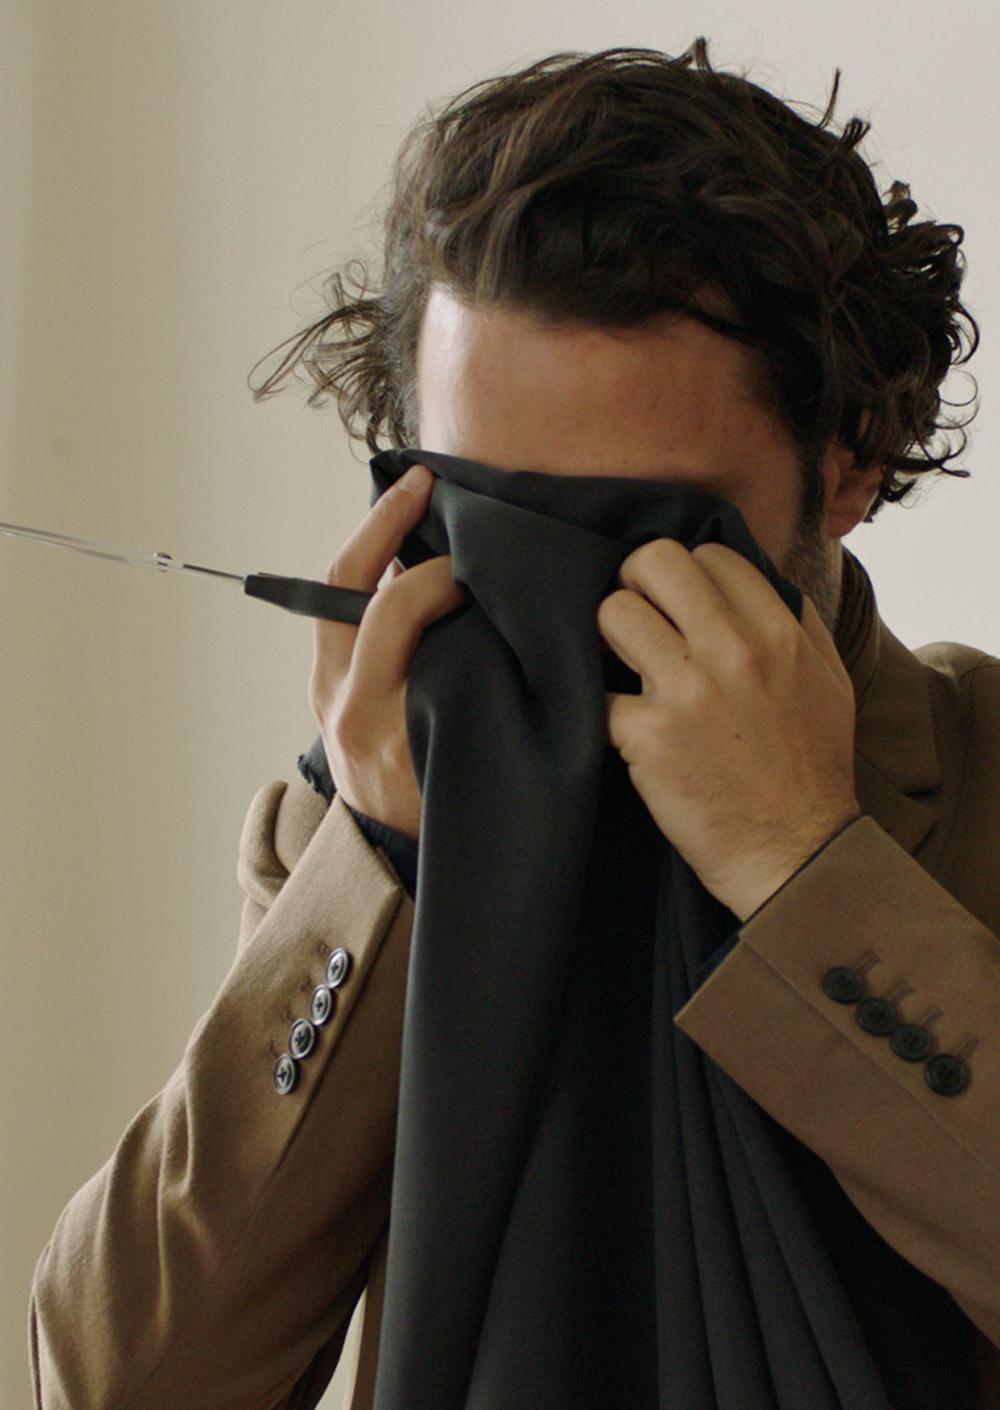 INTRODUZIONE ALL'OSCURO a Film by Gastón Solnicki | Little Magnet Films, Vienna